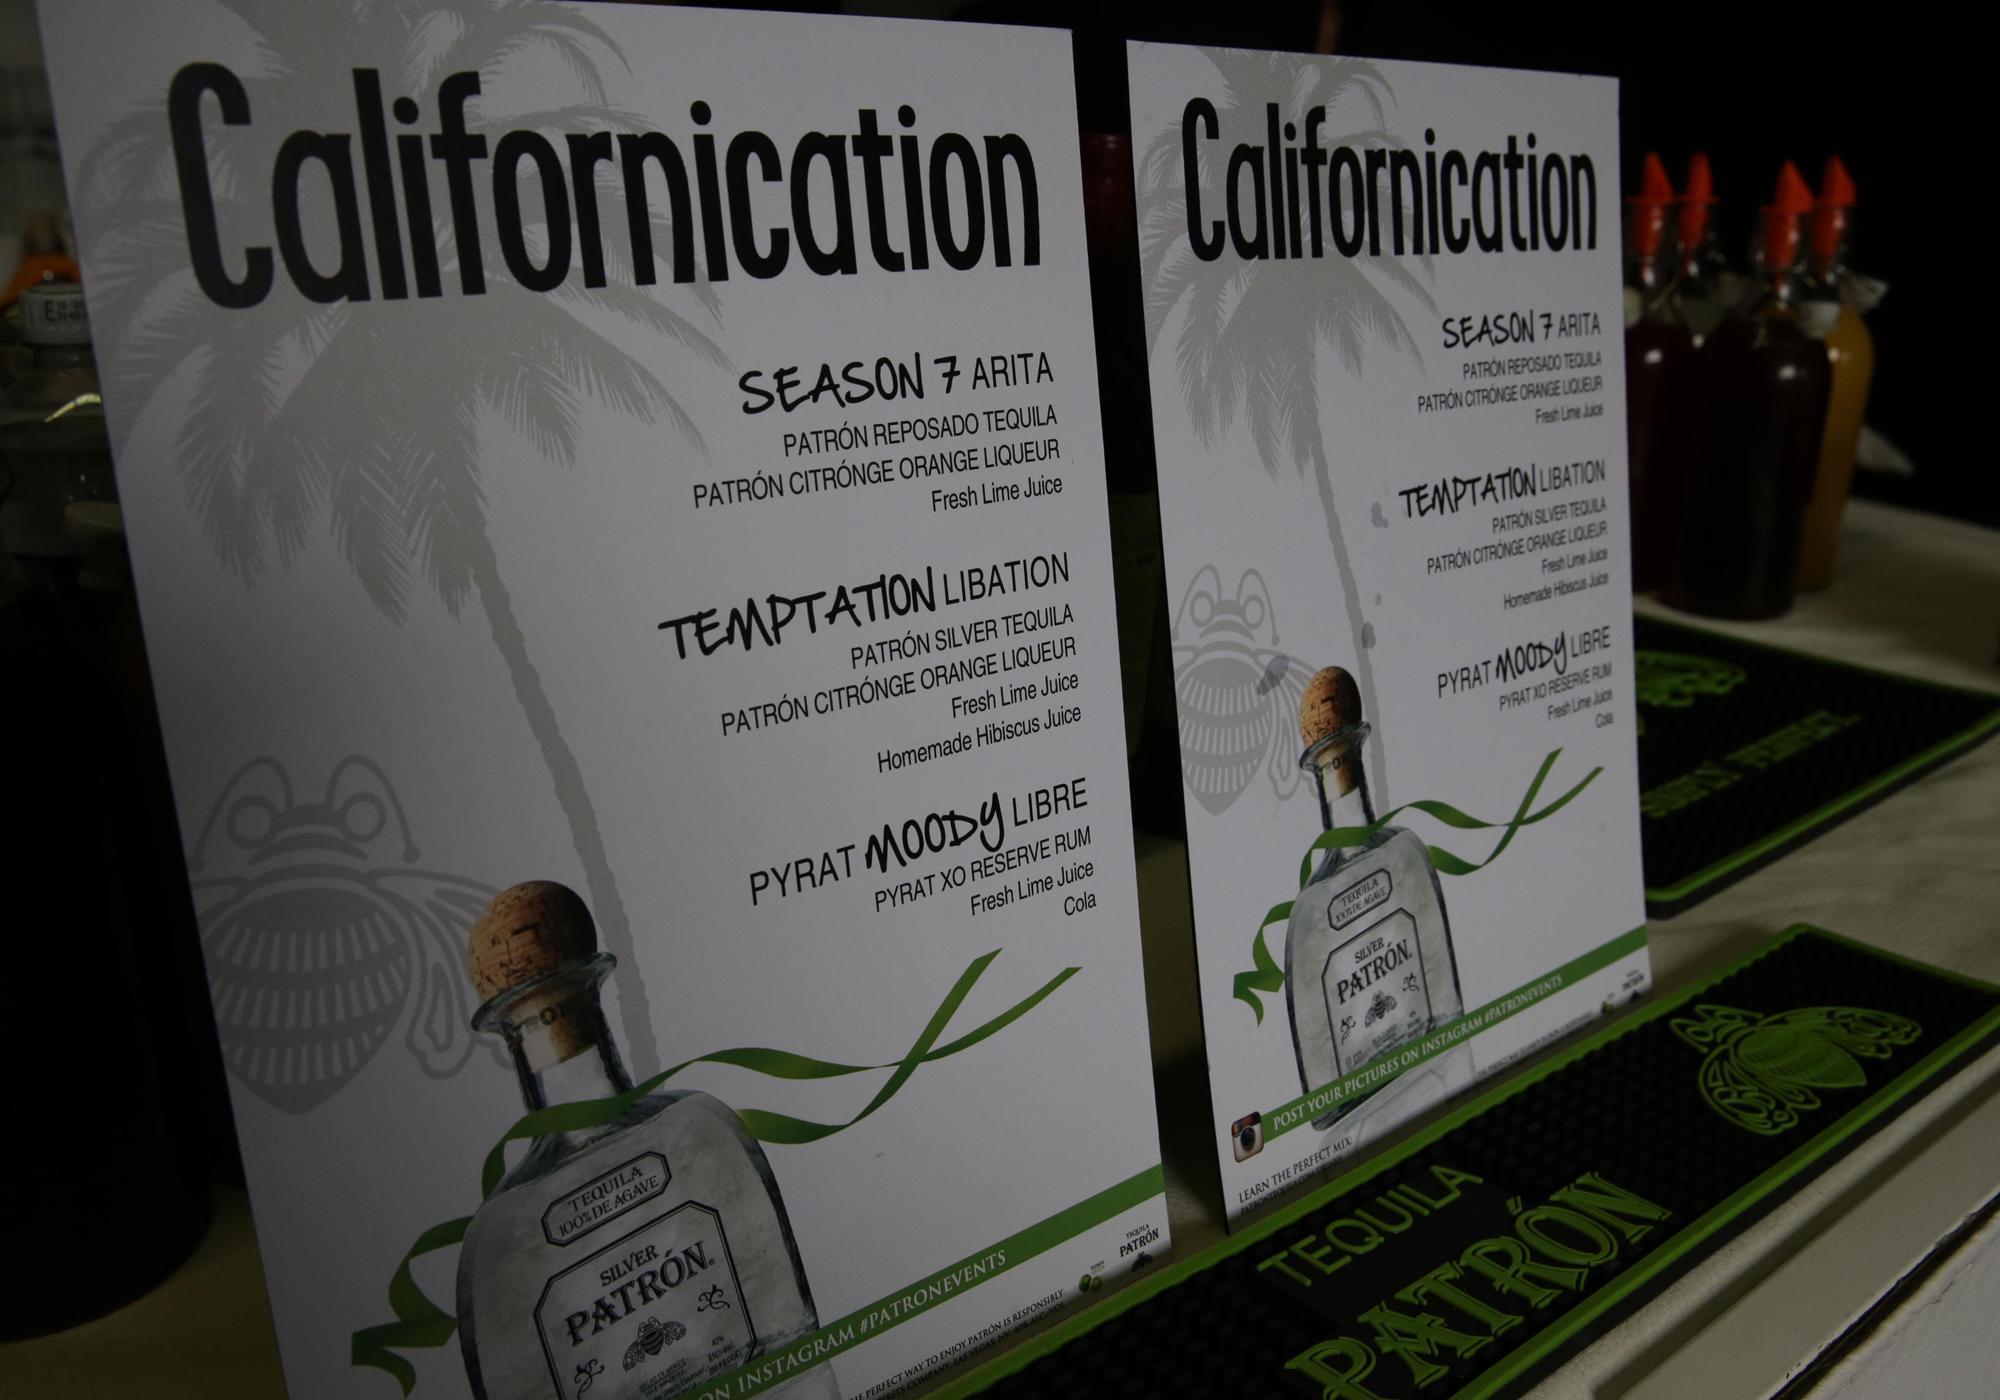 Californication - Season 7 - Wrap Party Photos (2)_FULL.jpg